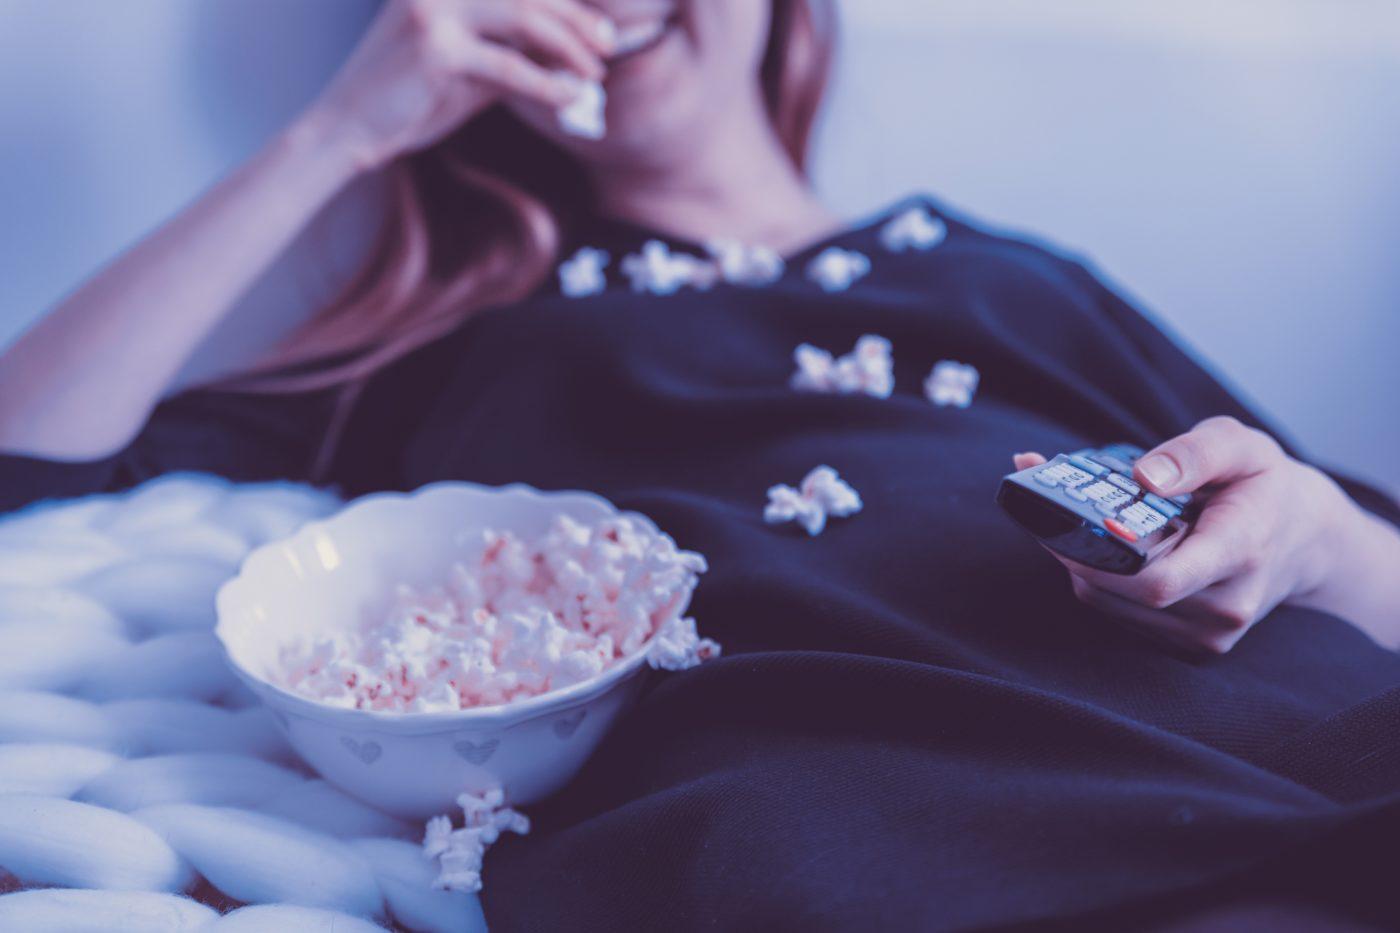 jeshoots com 606648 unsplash - Top 5 Netflix Food & Travel Shows to Binge on